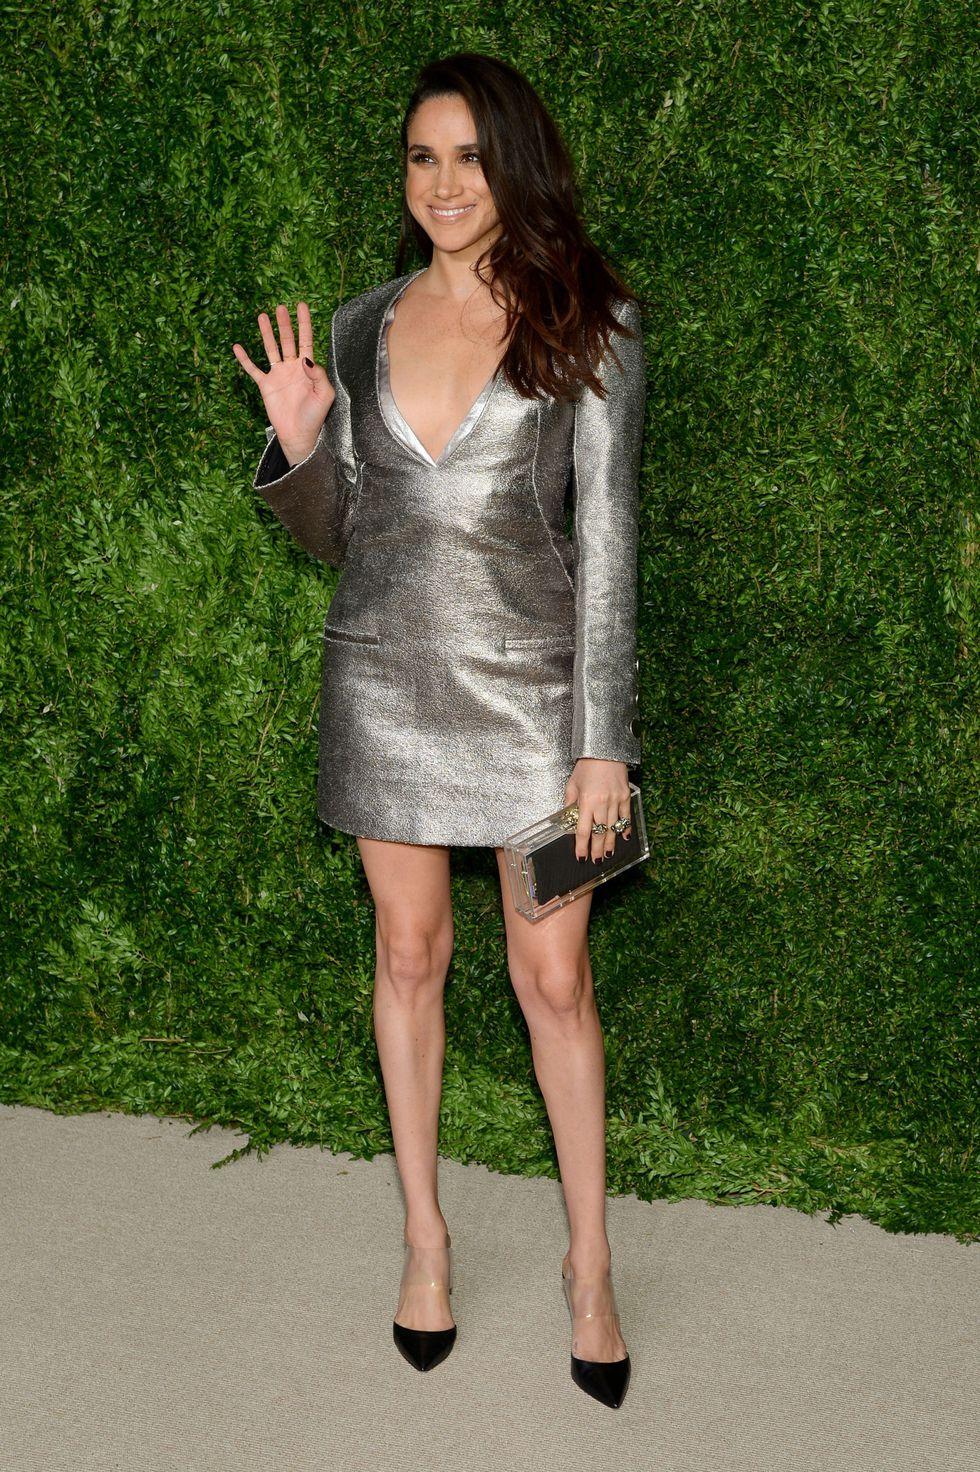 Меган Маркл в серебристом коротком платье